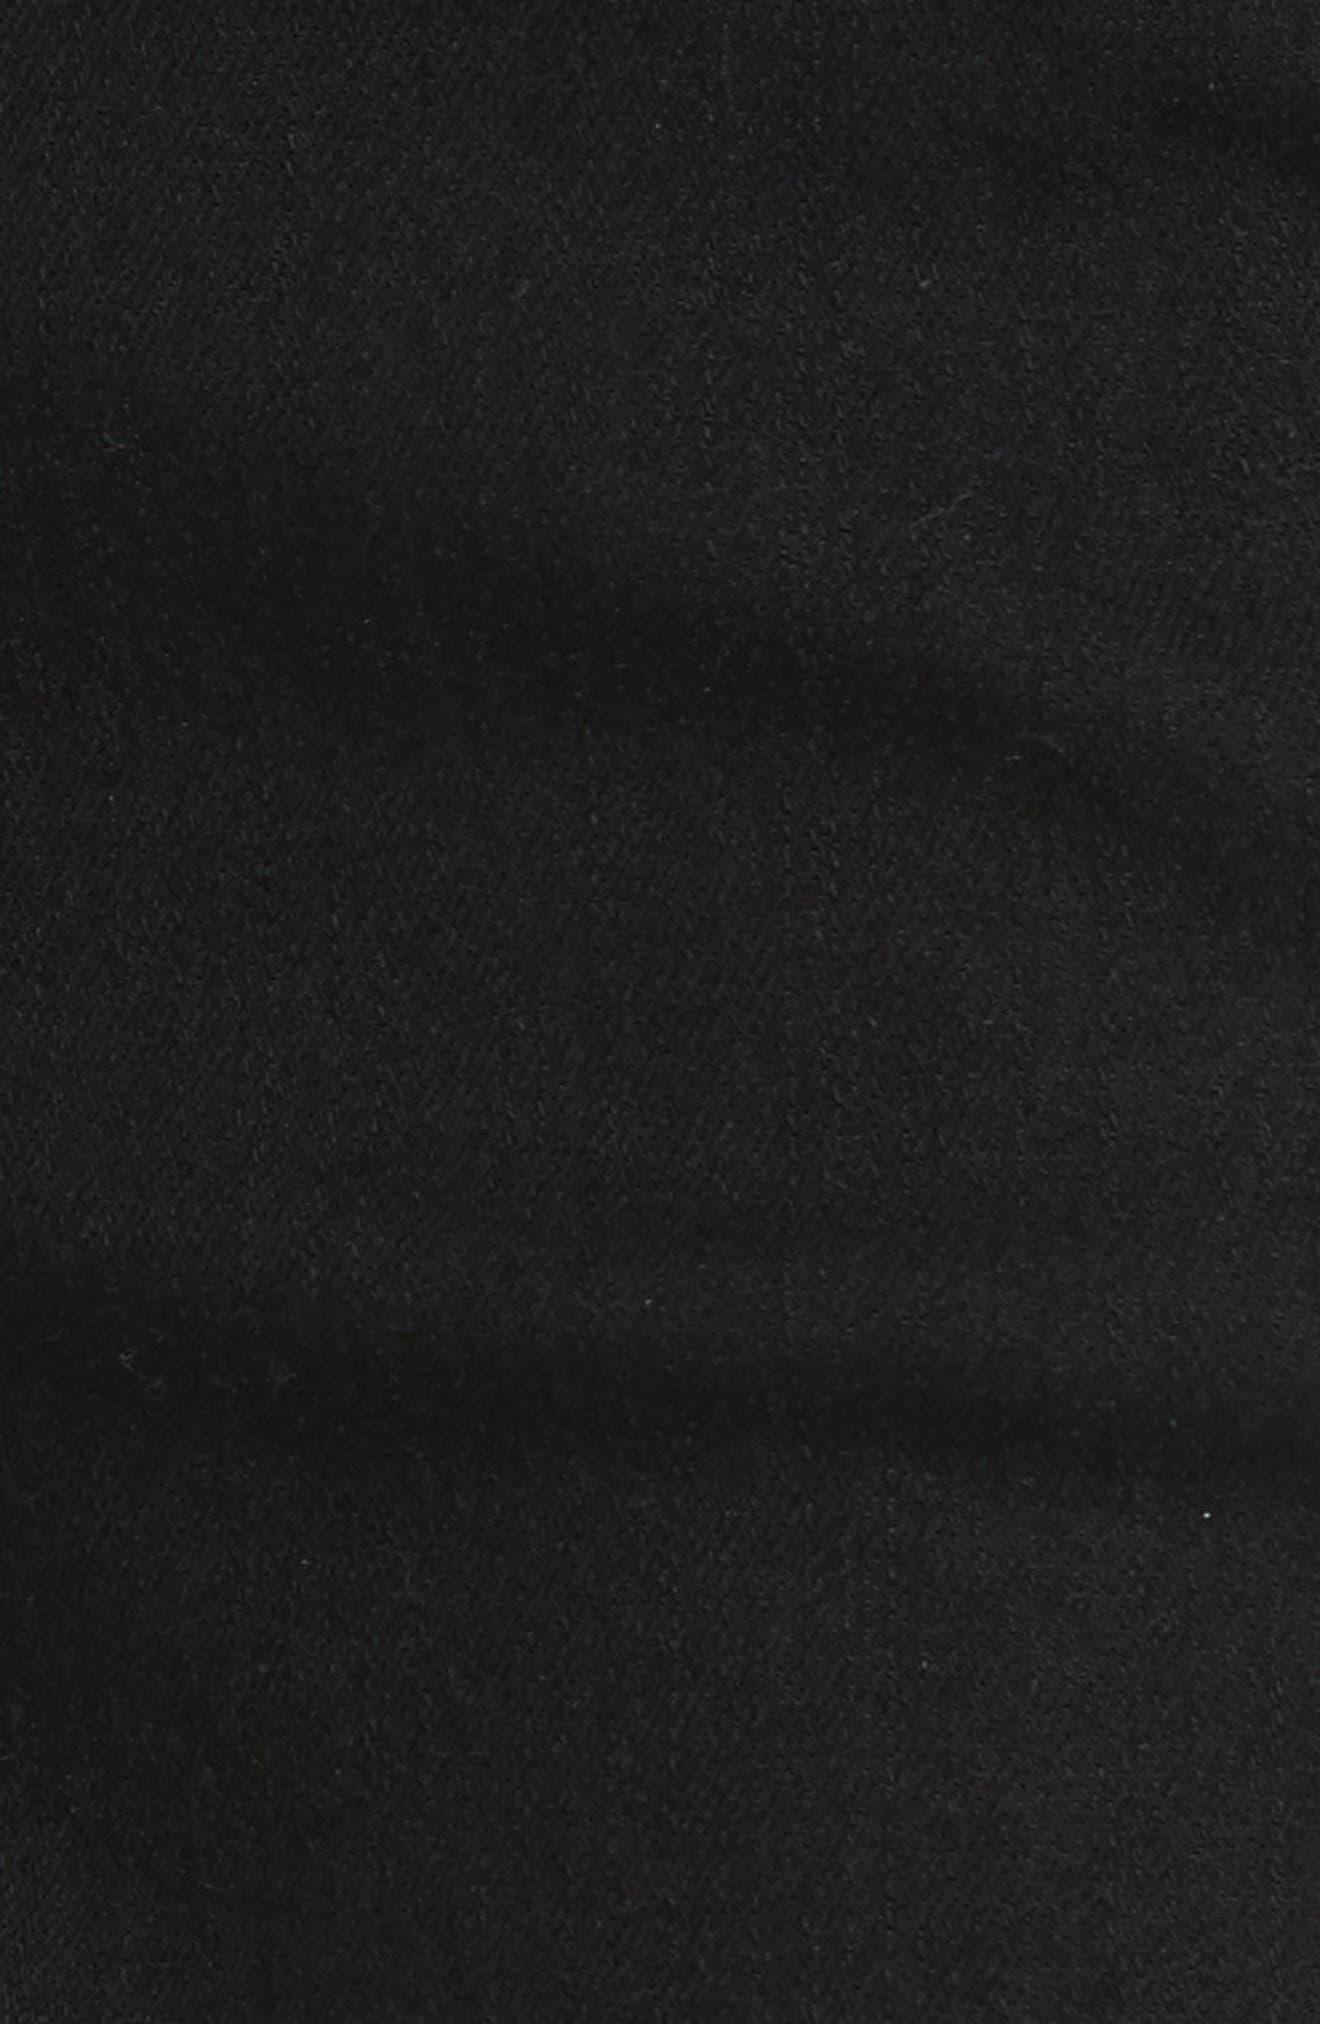 W4 Adeline High Waist Split Flare Jeans,                             Alternate thumbnail 5, color,                             Black No 1